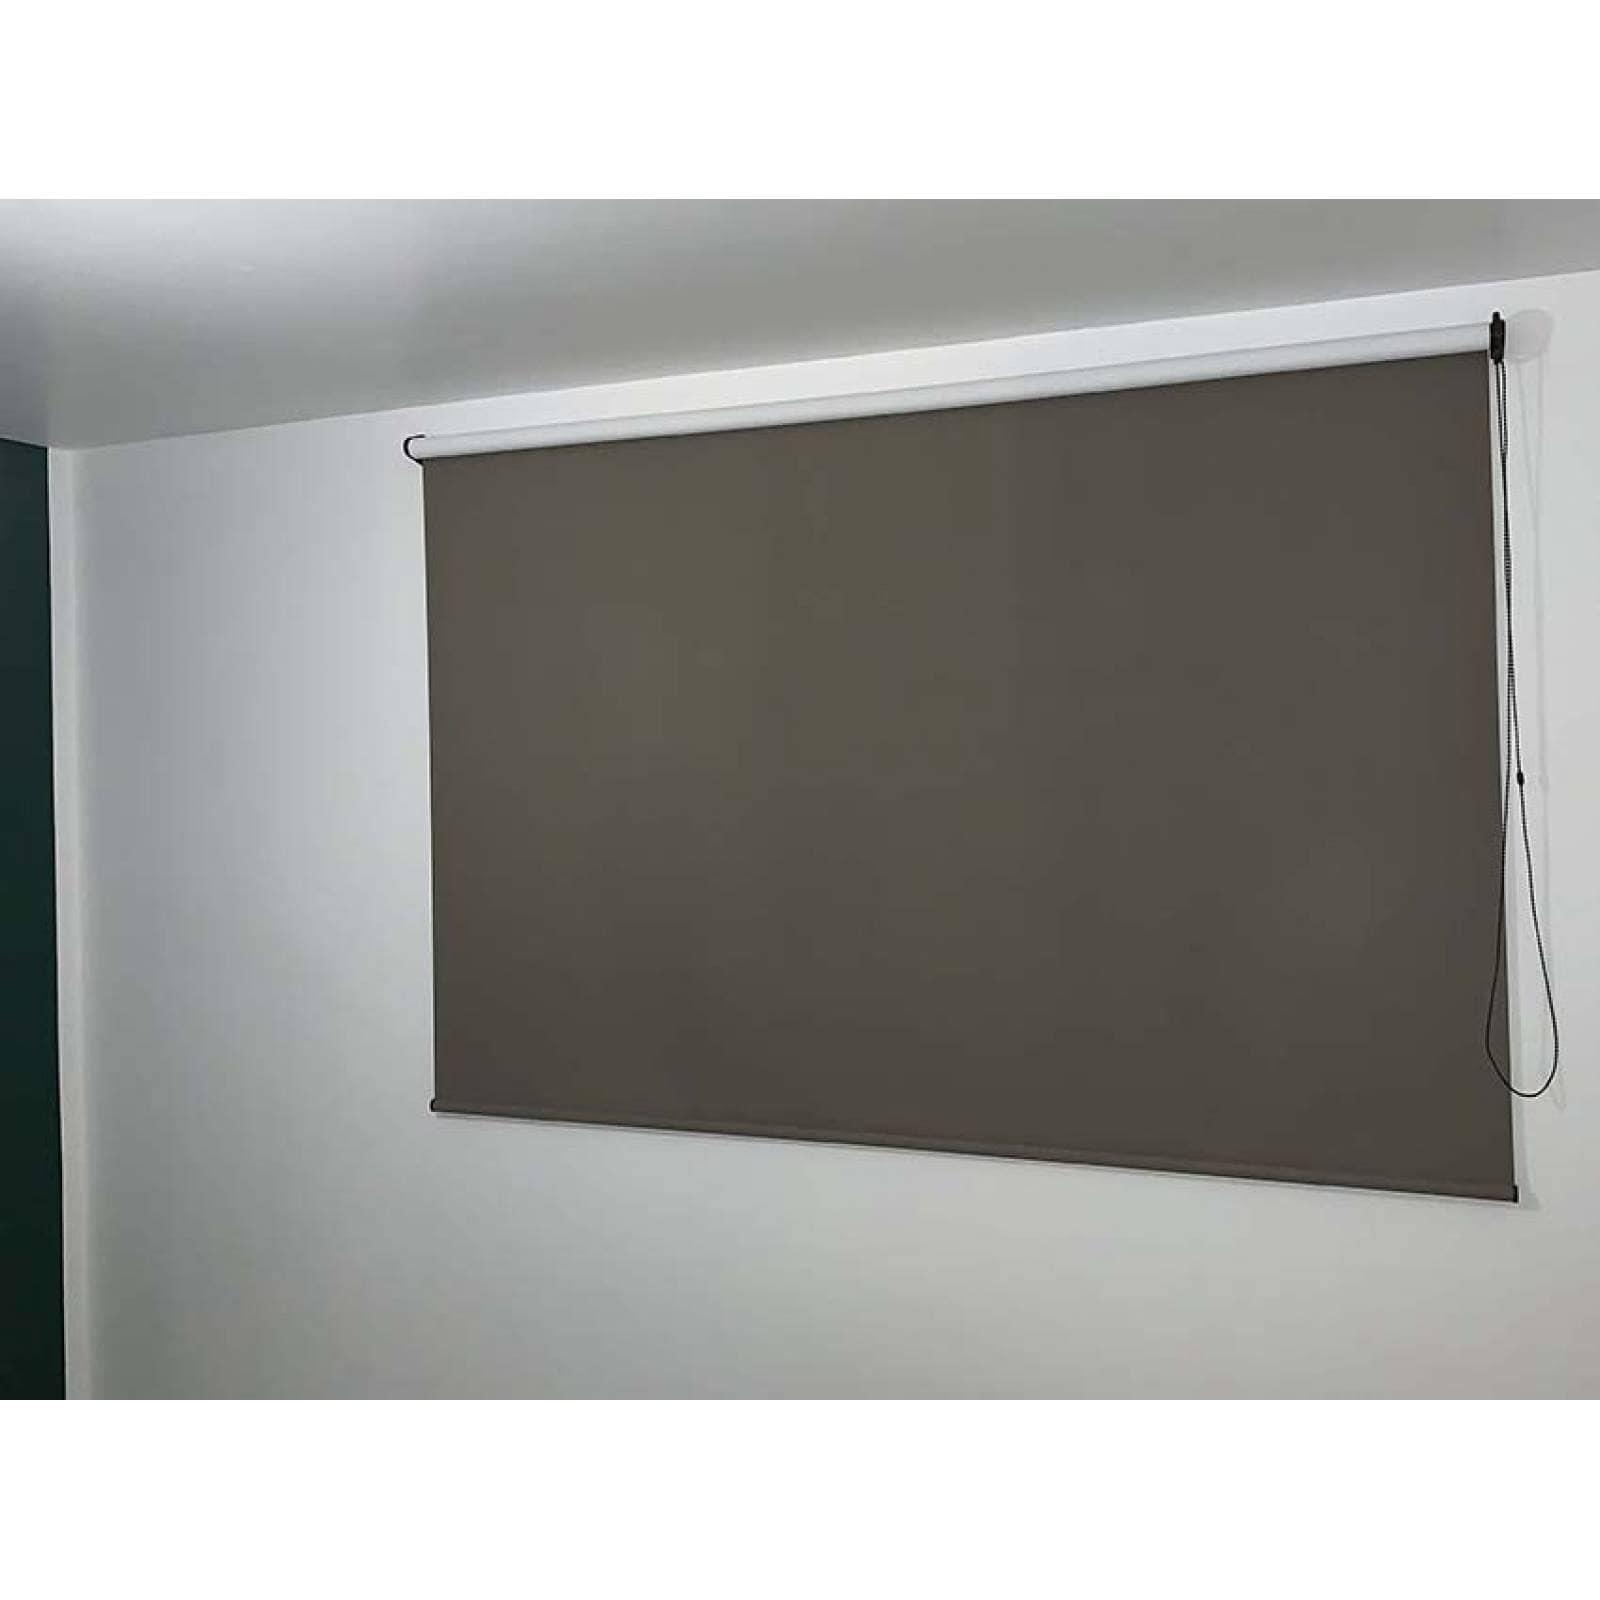 Persianas Blackout modelo Montreal 100 cm de ancho X hasta 100 cm de largo